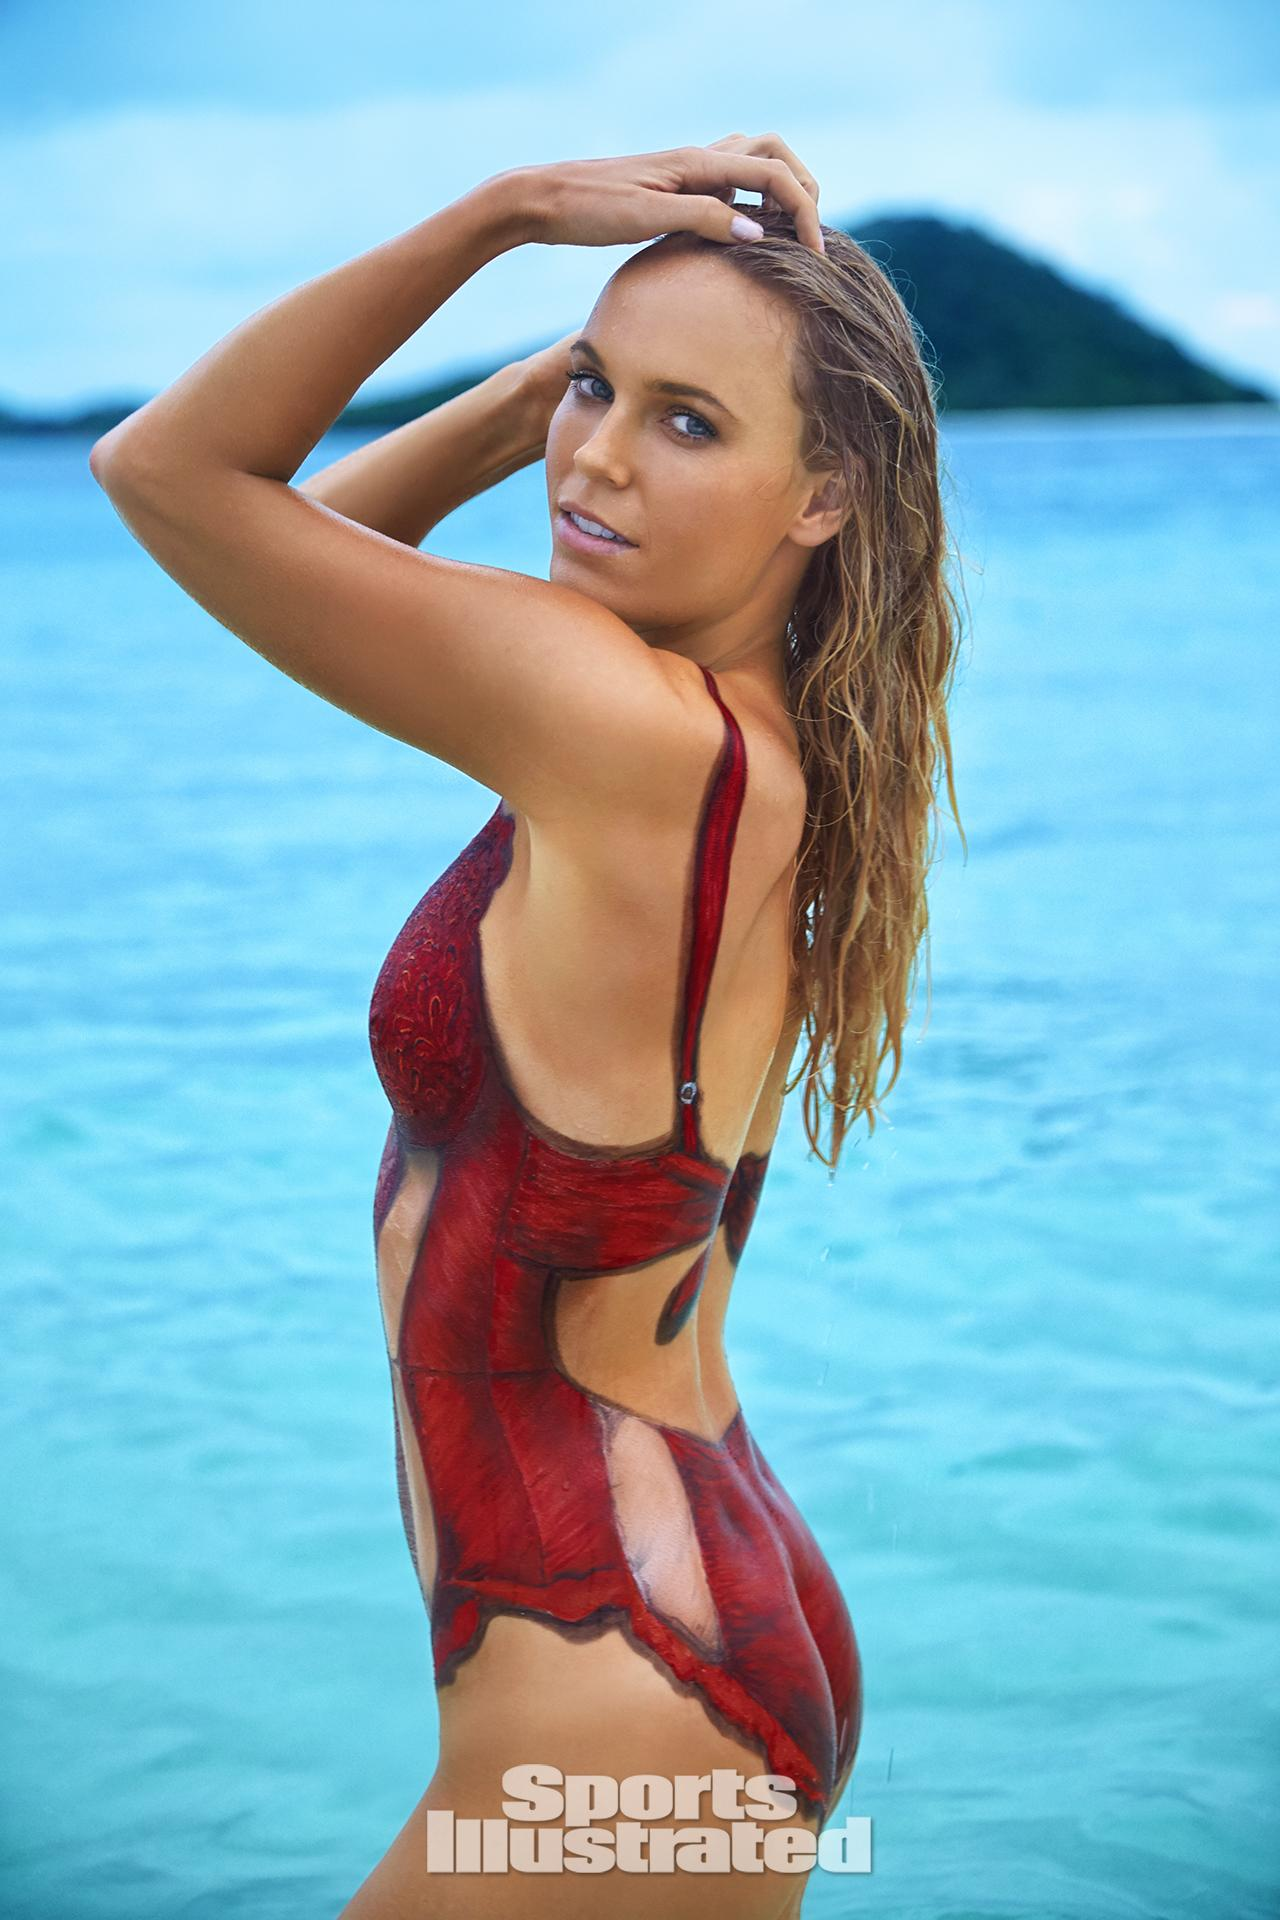 ... Wozniacki Swimsuit Body Paint Photos, Sports Illustrated Swimsuit 2016